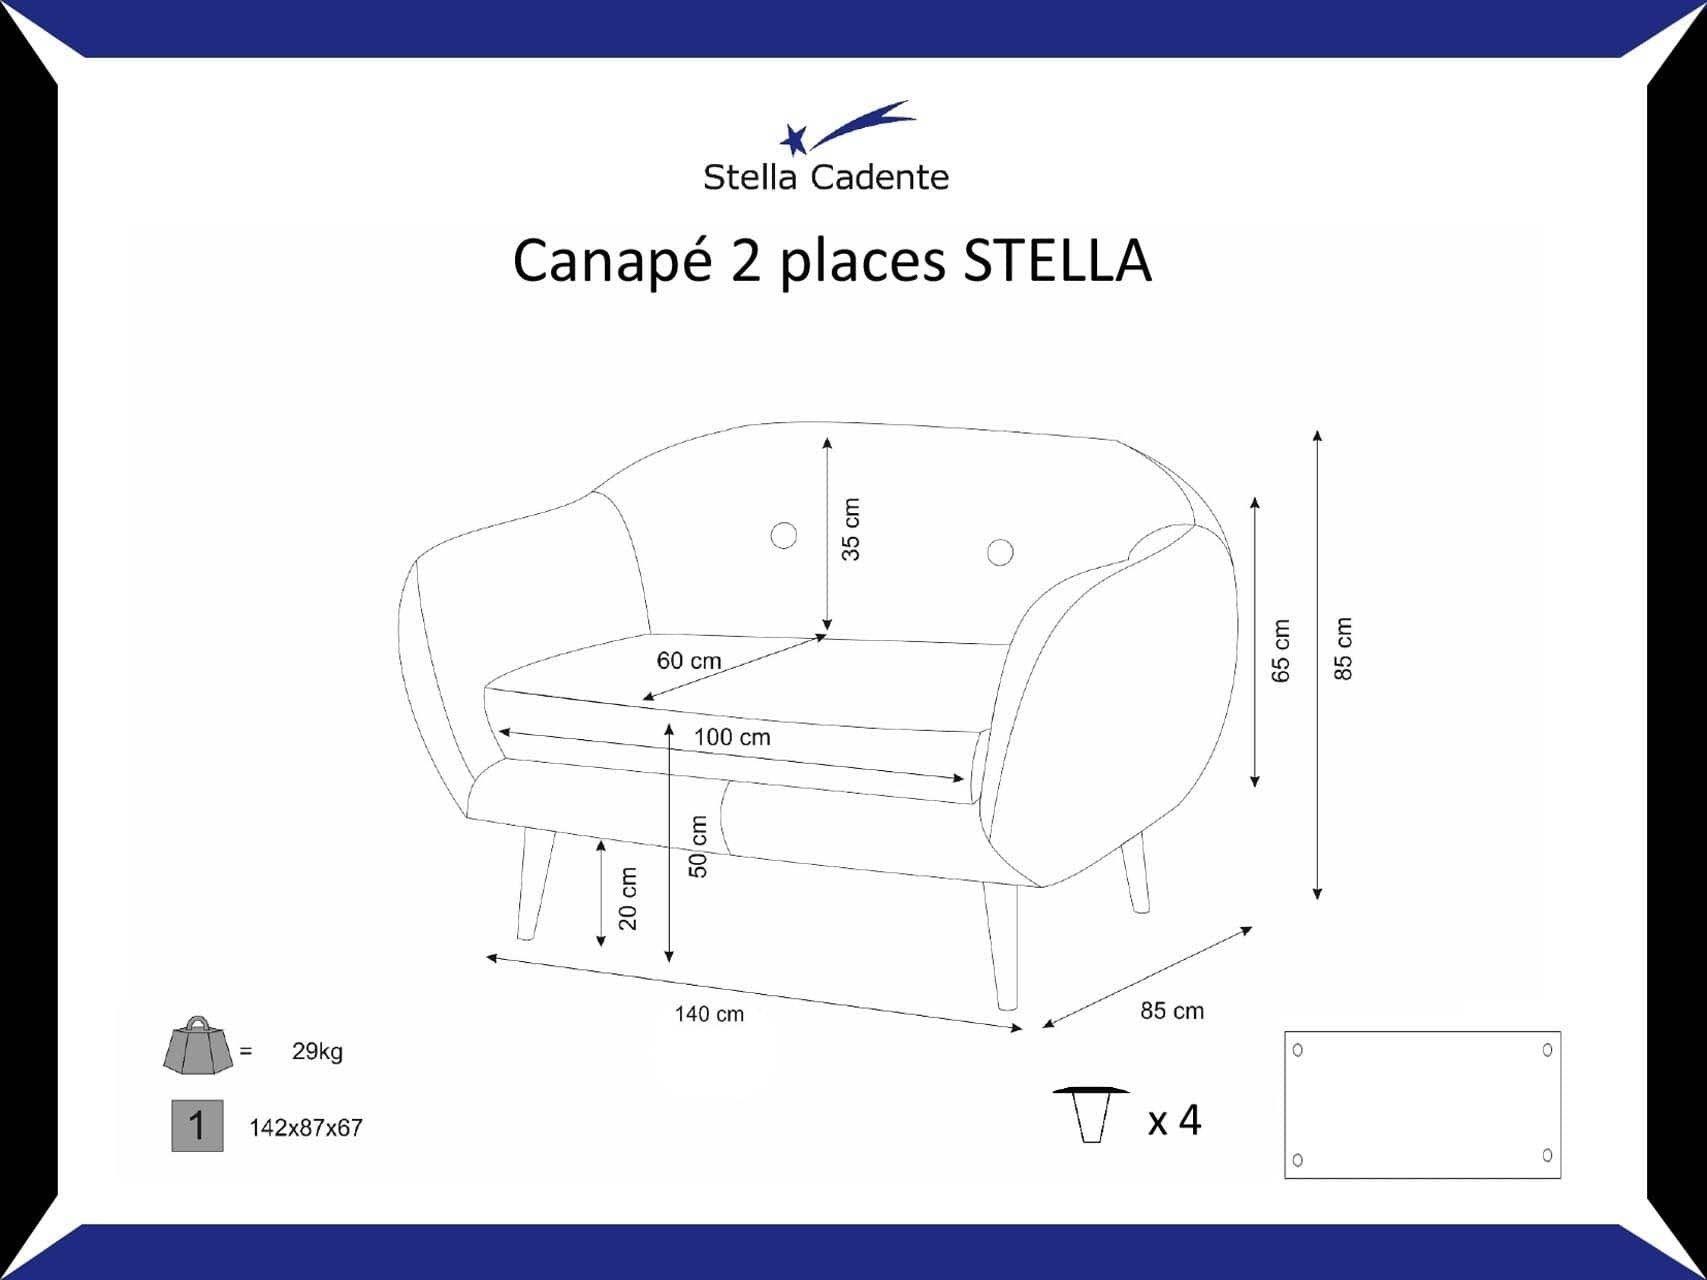 Canape Scandinave 2 Places Anthracite Stella Cadente Maison Stella Canape Scandinave 2 Places Canape Scandinave Maison